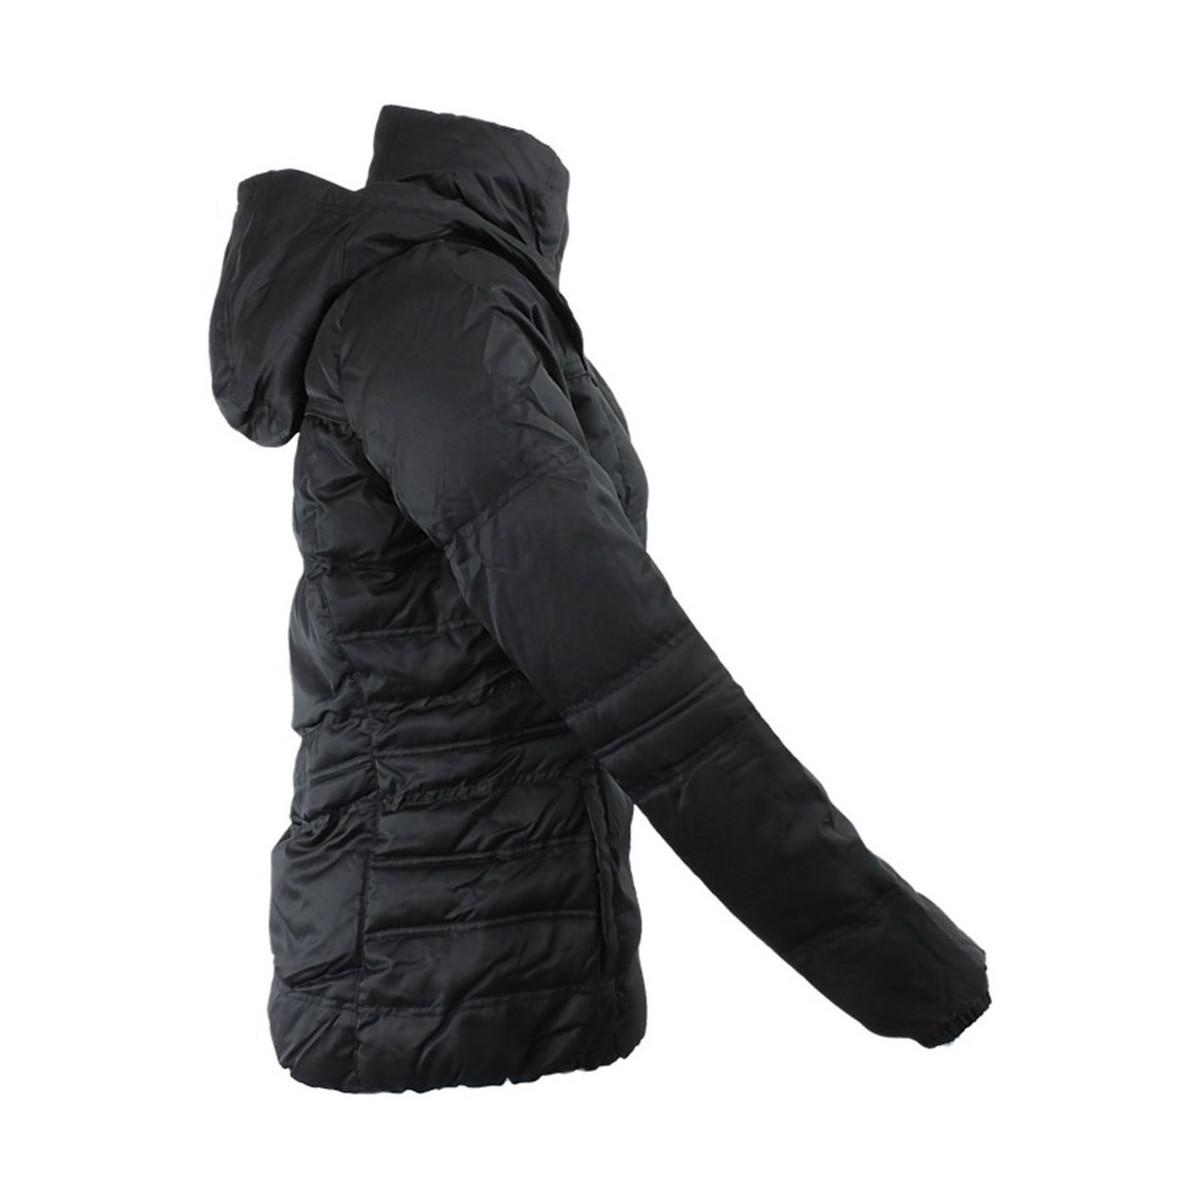 e847adf4b835 adidas J Down Jacket Women s Jacket In Black in Black - Lyst